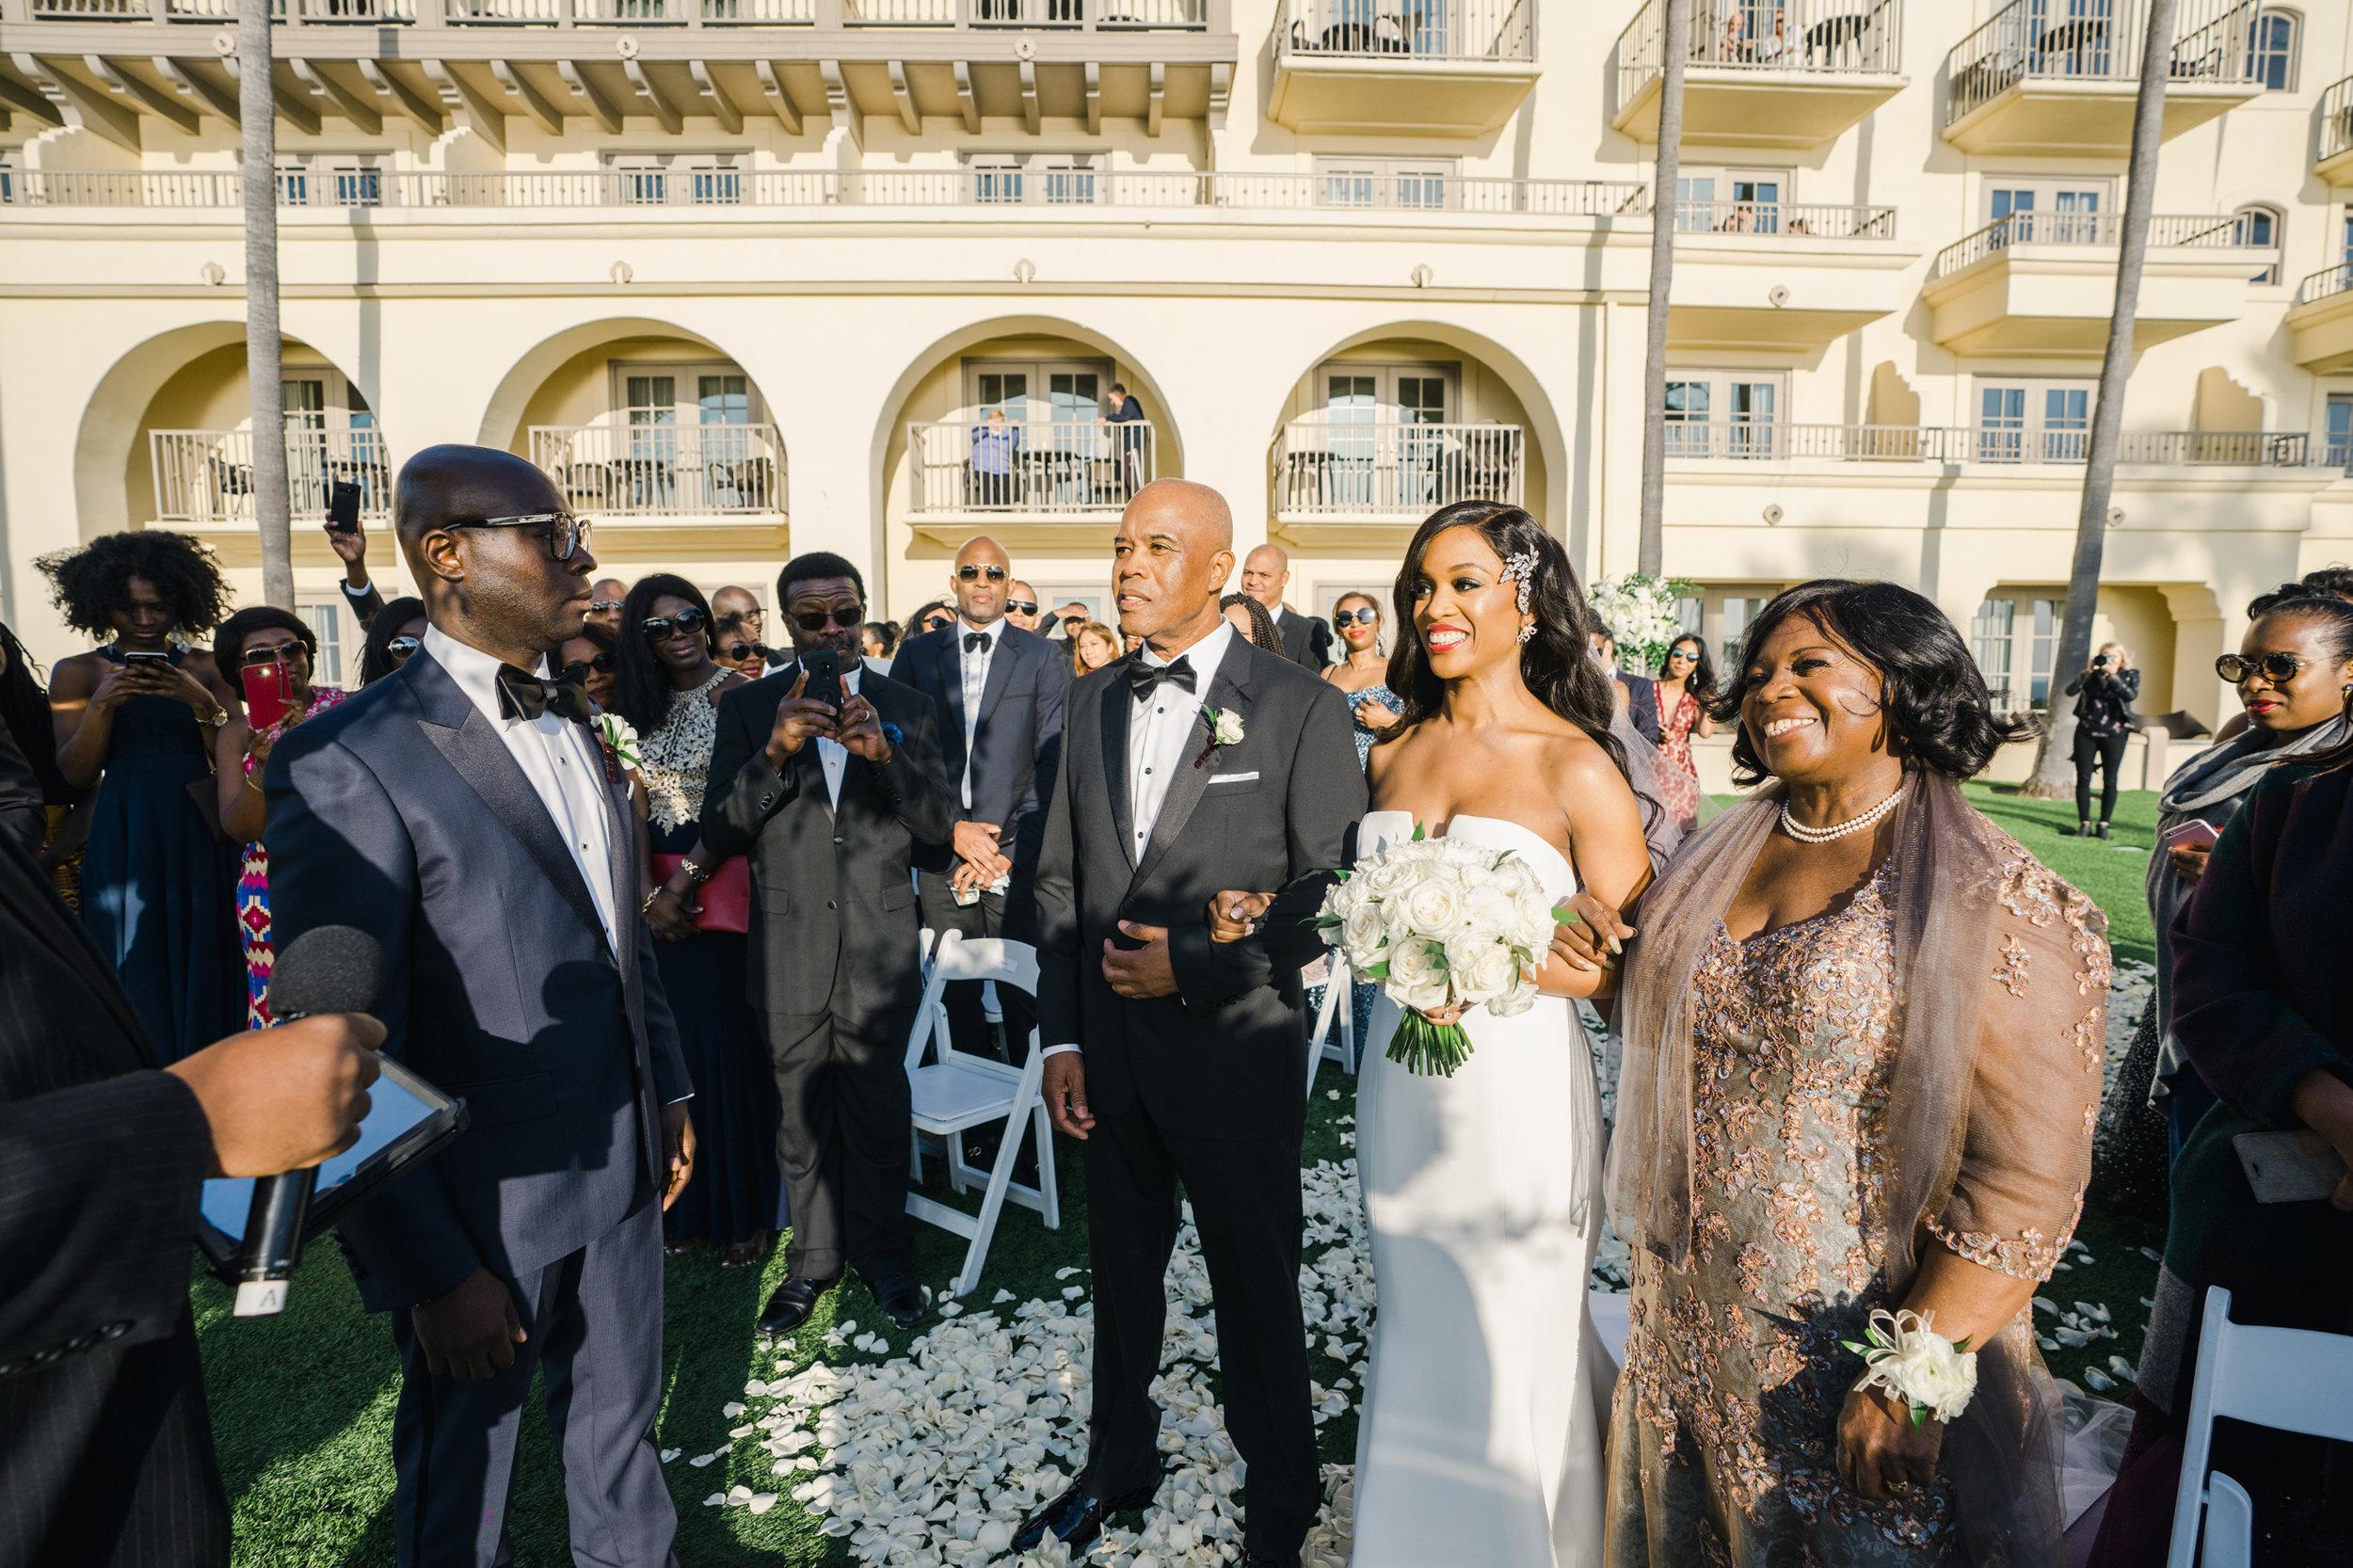 ritz-carlton-laguna-niguel-wedding-sonya_0119.JPG